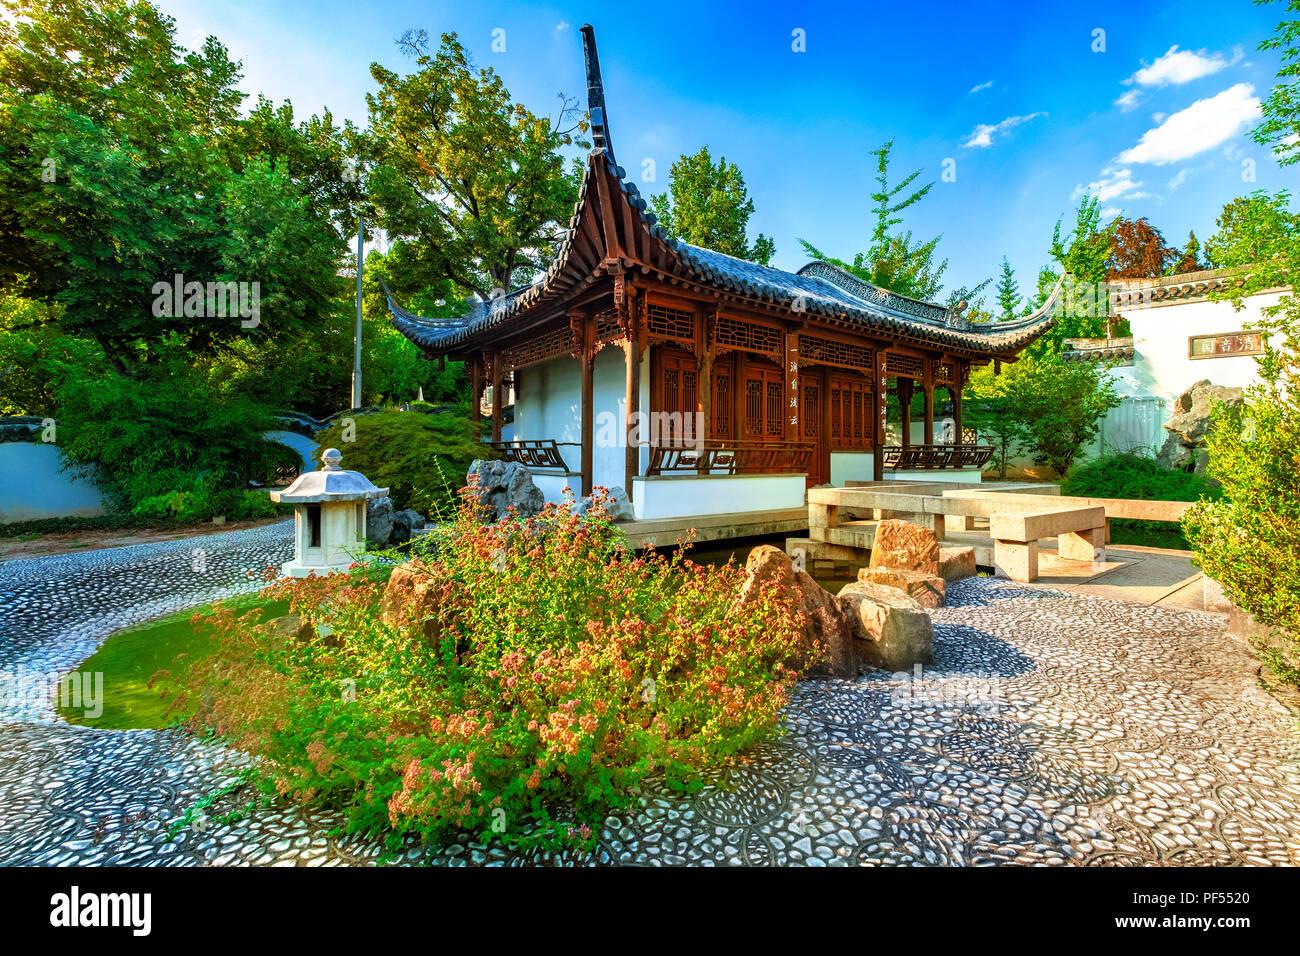 China Garten China Garten Hagenbecks Foto Bild Landschaft Garten